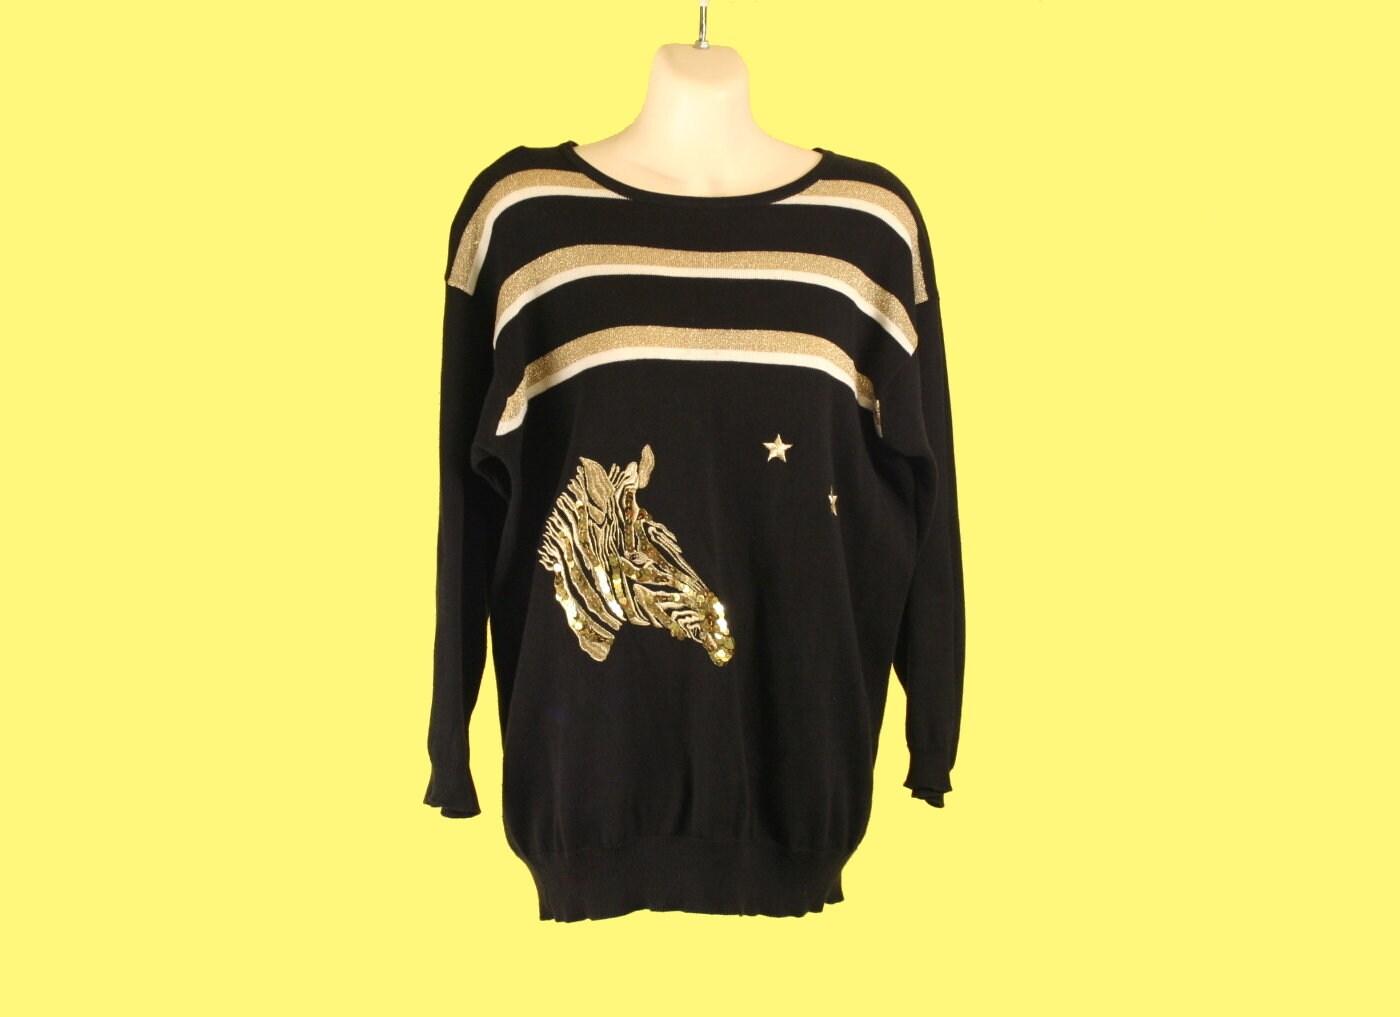 abbfd03cf0e Vintage 80 s Sequin Zebra Light Sweater Metallic Gold